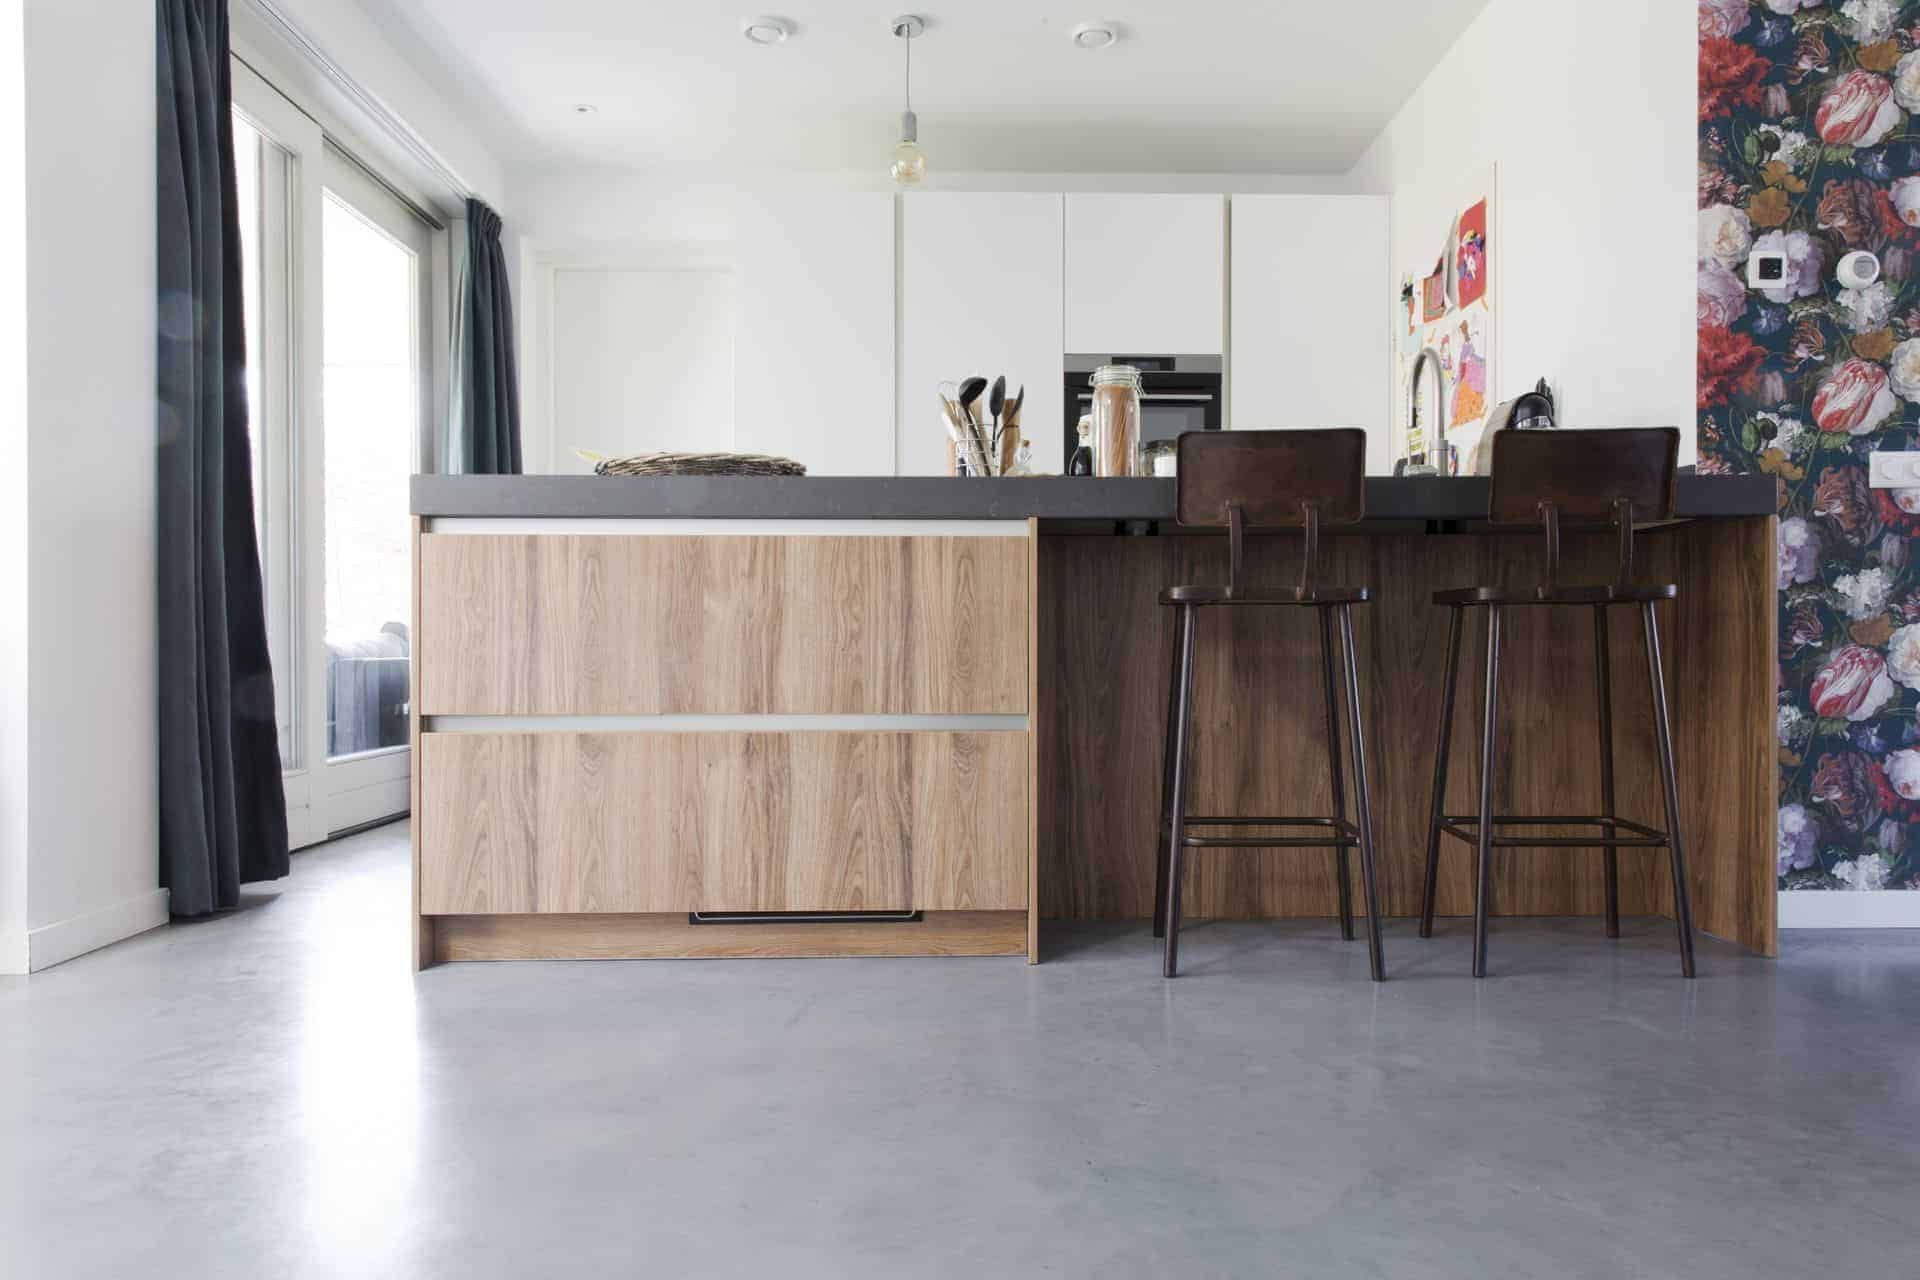 Woonbeton keuken, gevlinderd beton, gevlinderd betonvloer